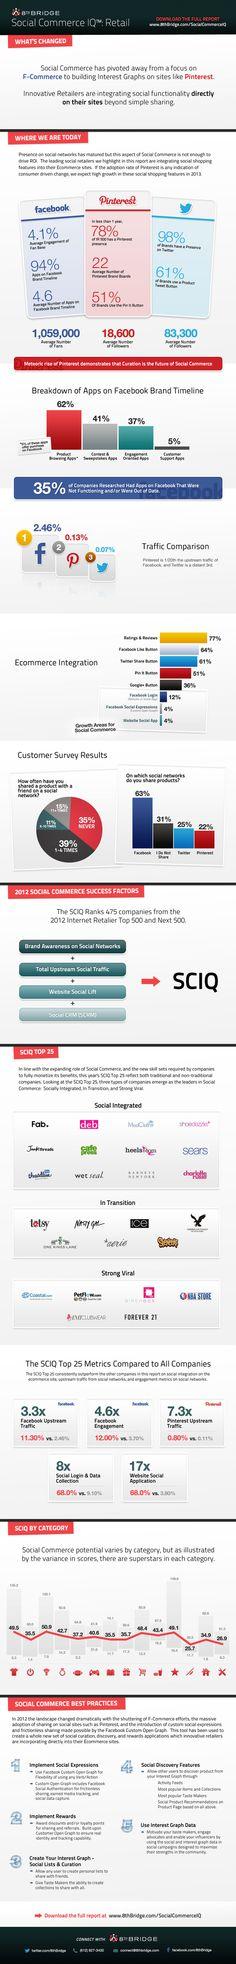 Social Commerce #Trends 2013 #Infographic www.socialmediamamma.com